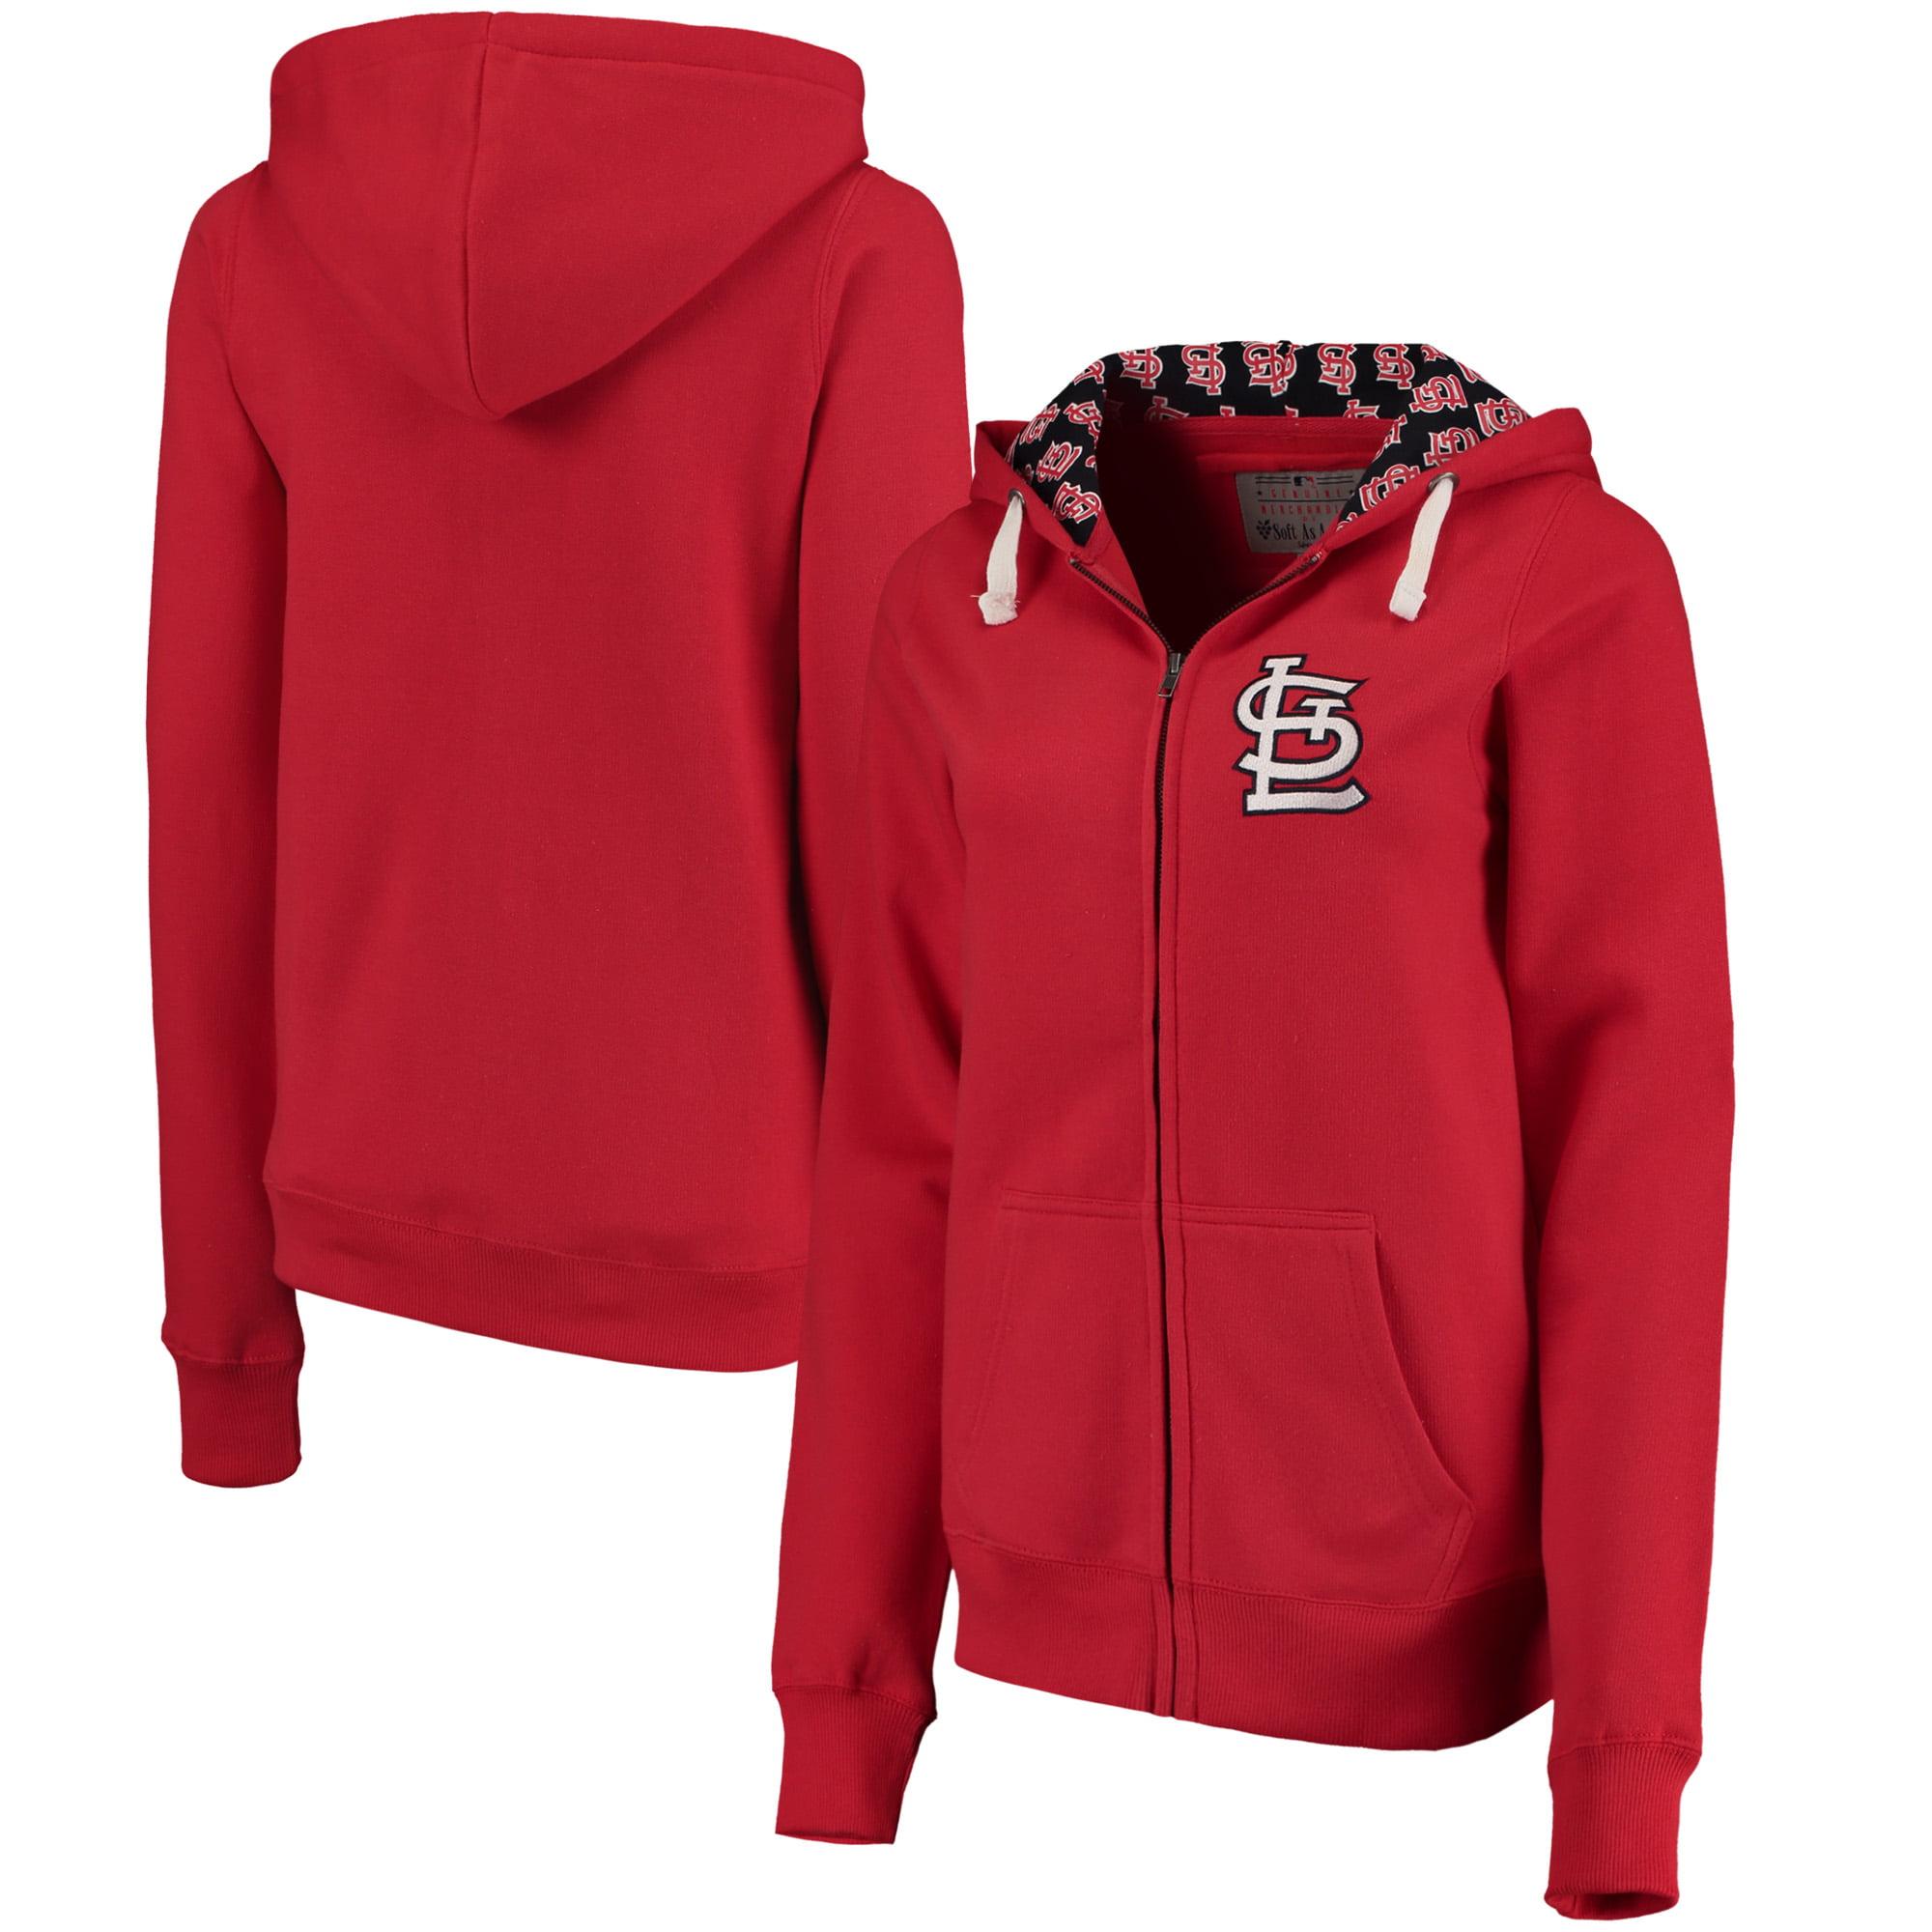 St. Louis Cardinals Soft as a Grape Women's Line Drive Full-Zip Hoodie - Red